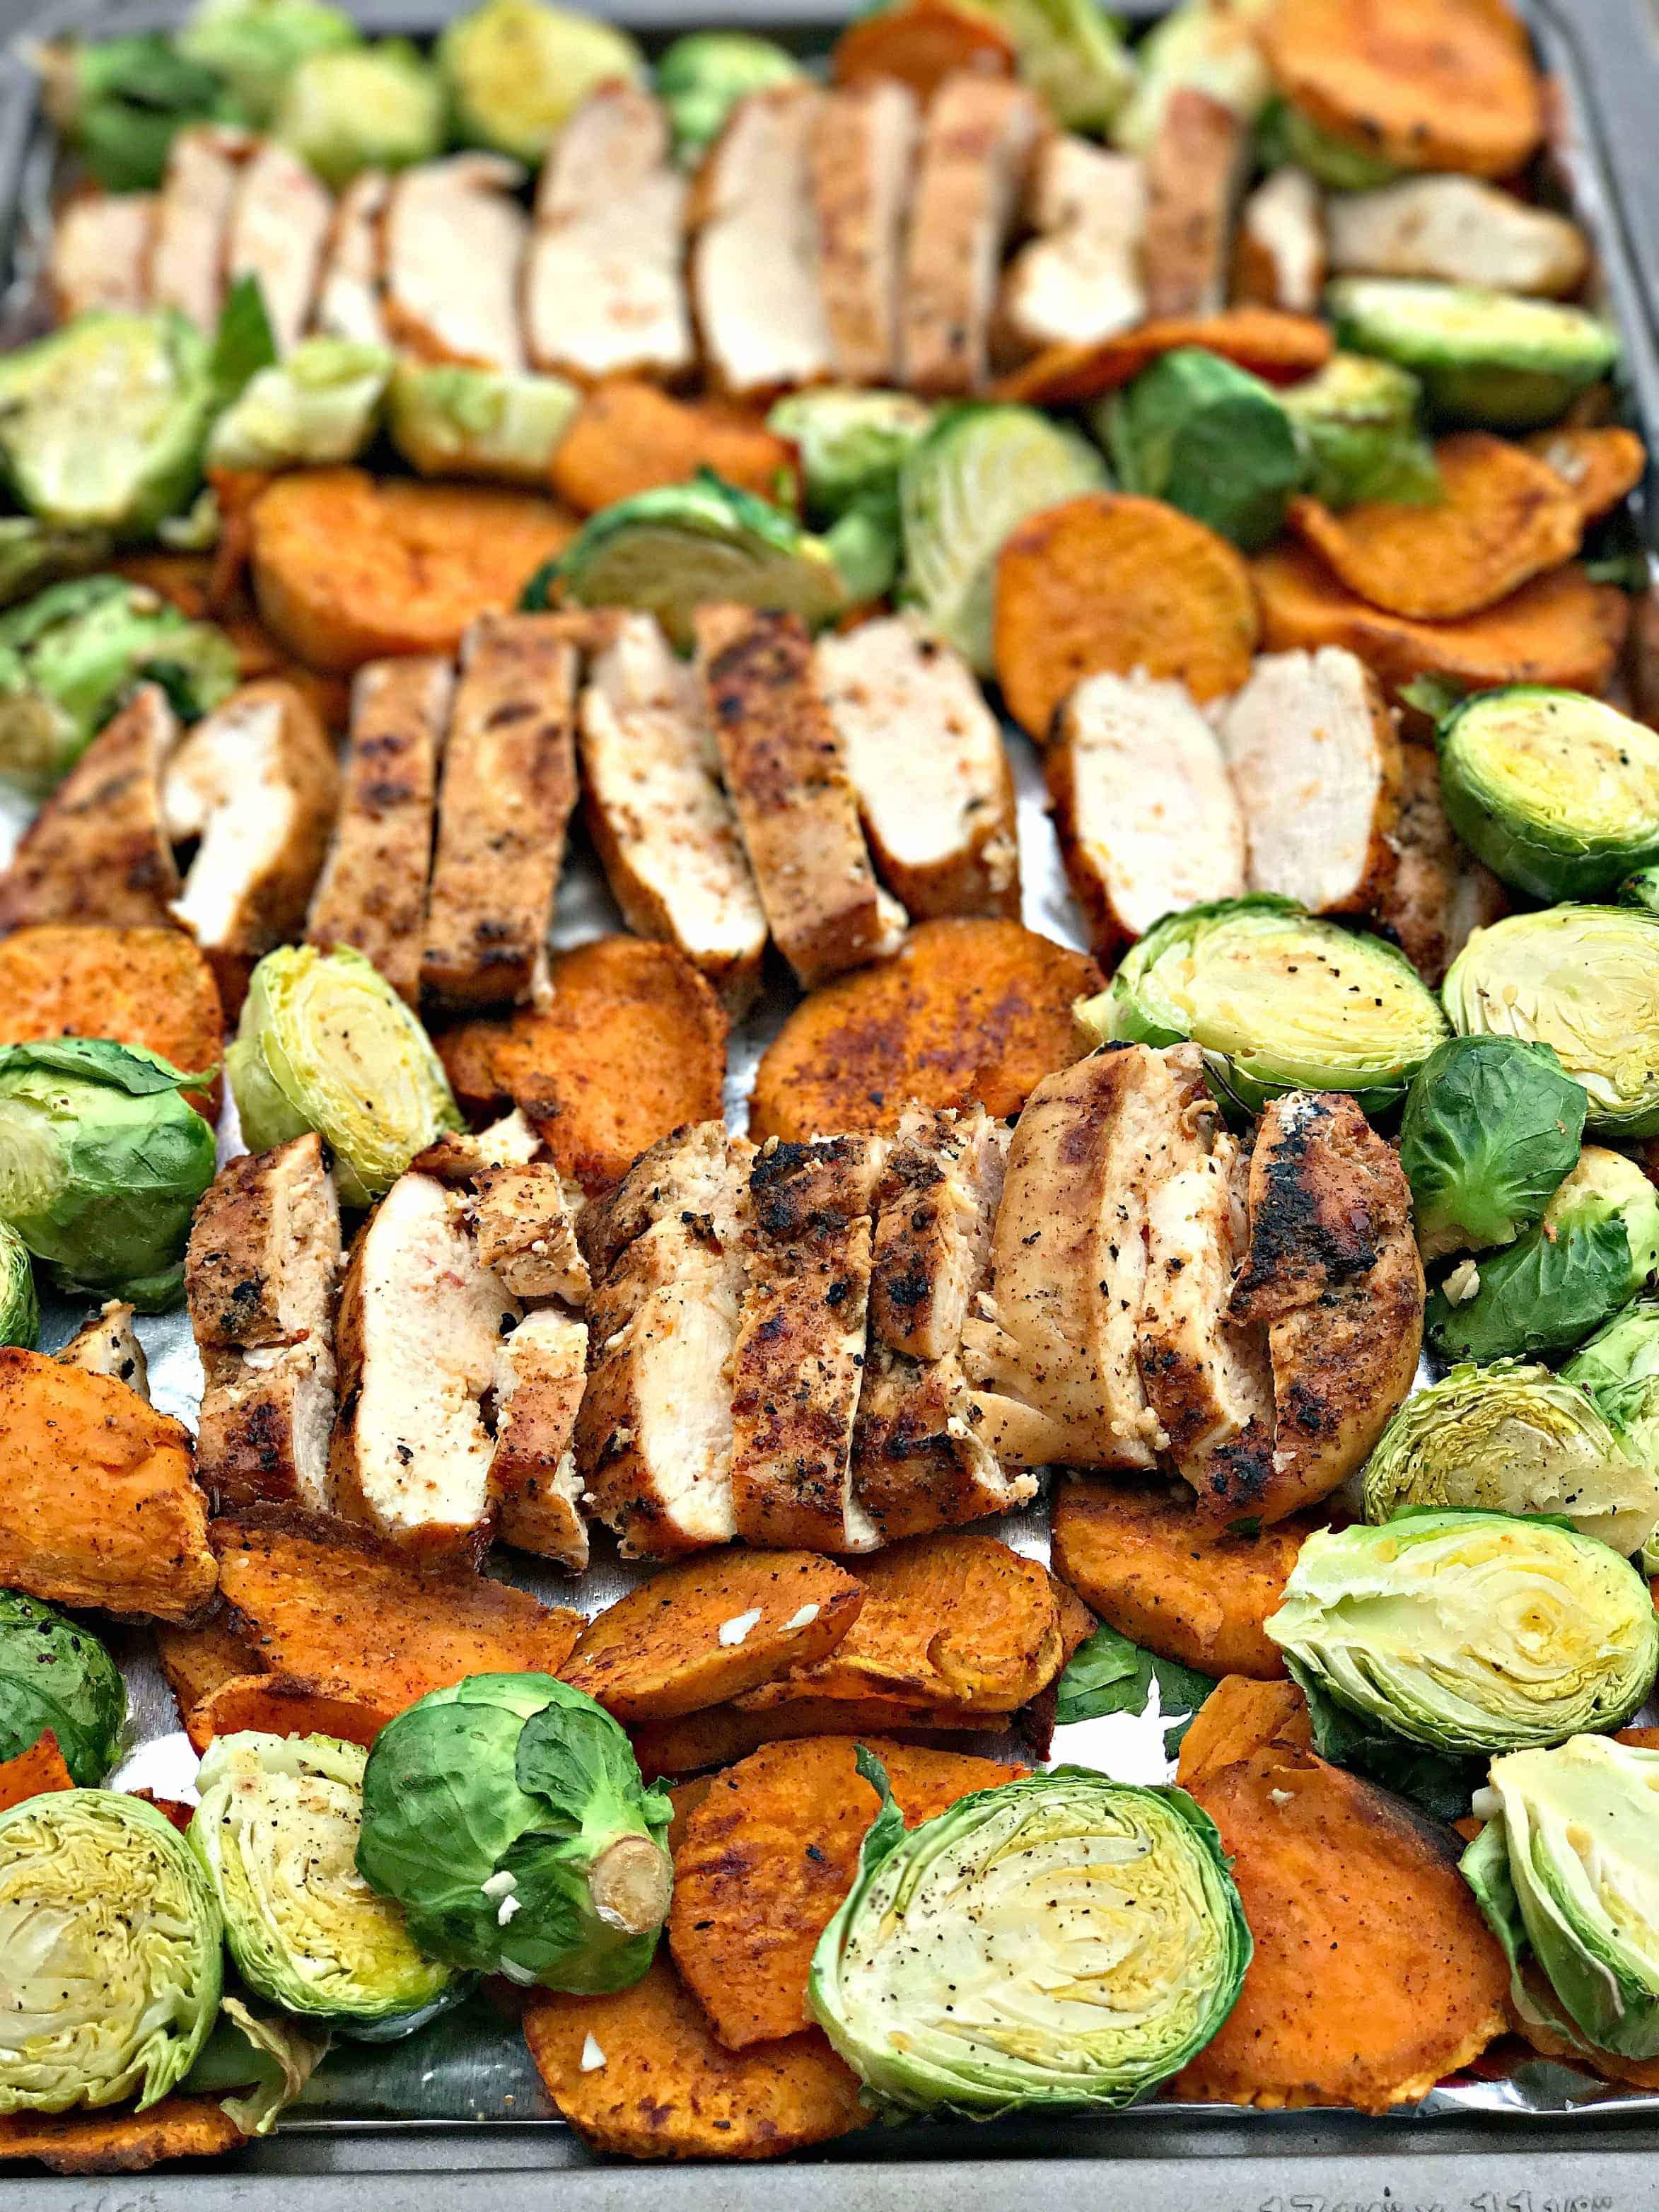 Sheet Pan Chicken and Sweet Potatoes